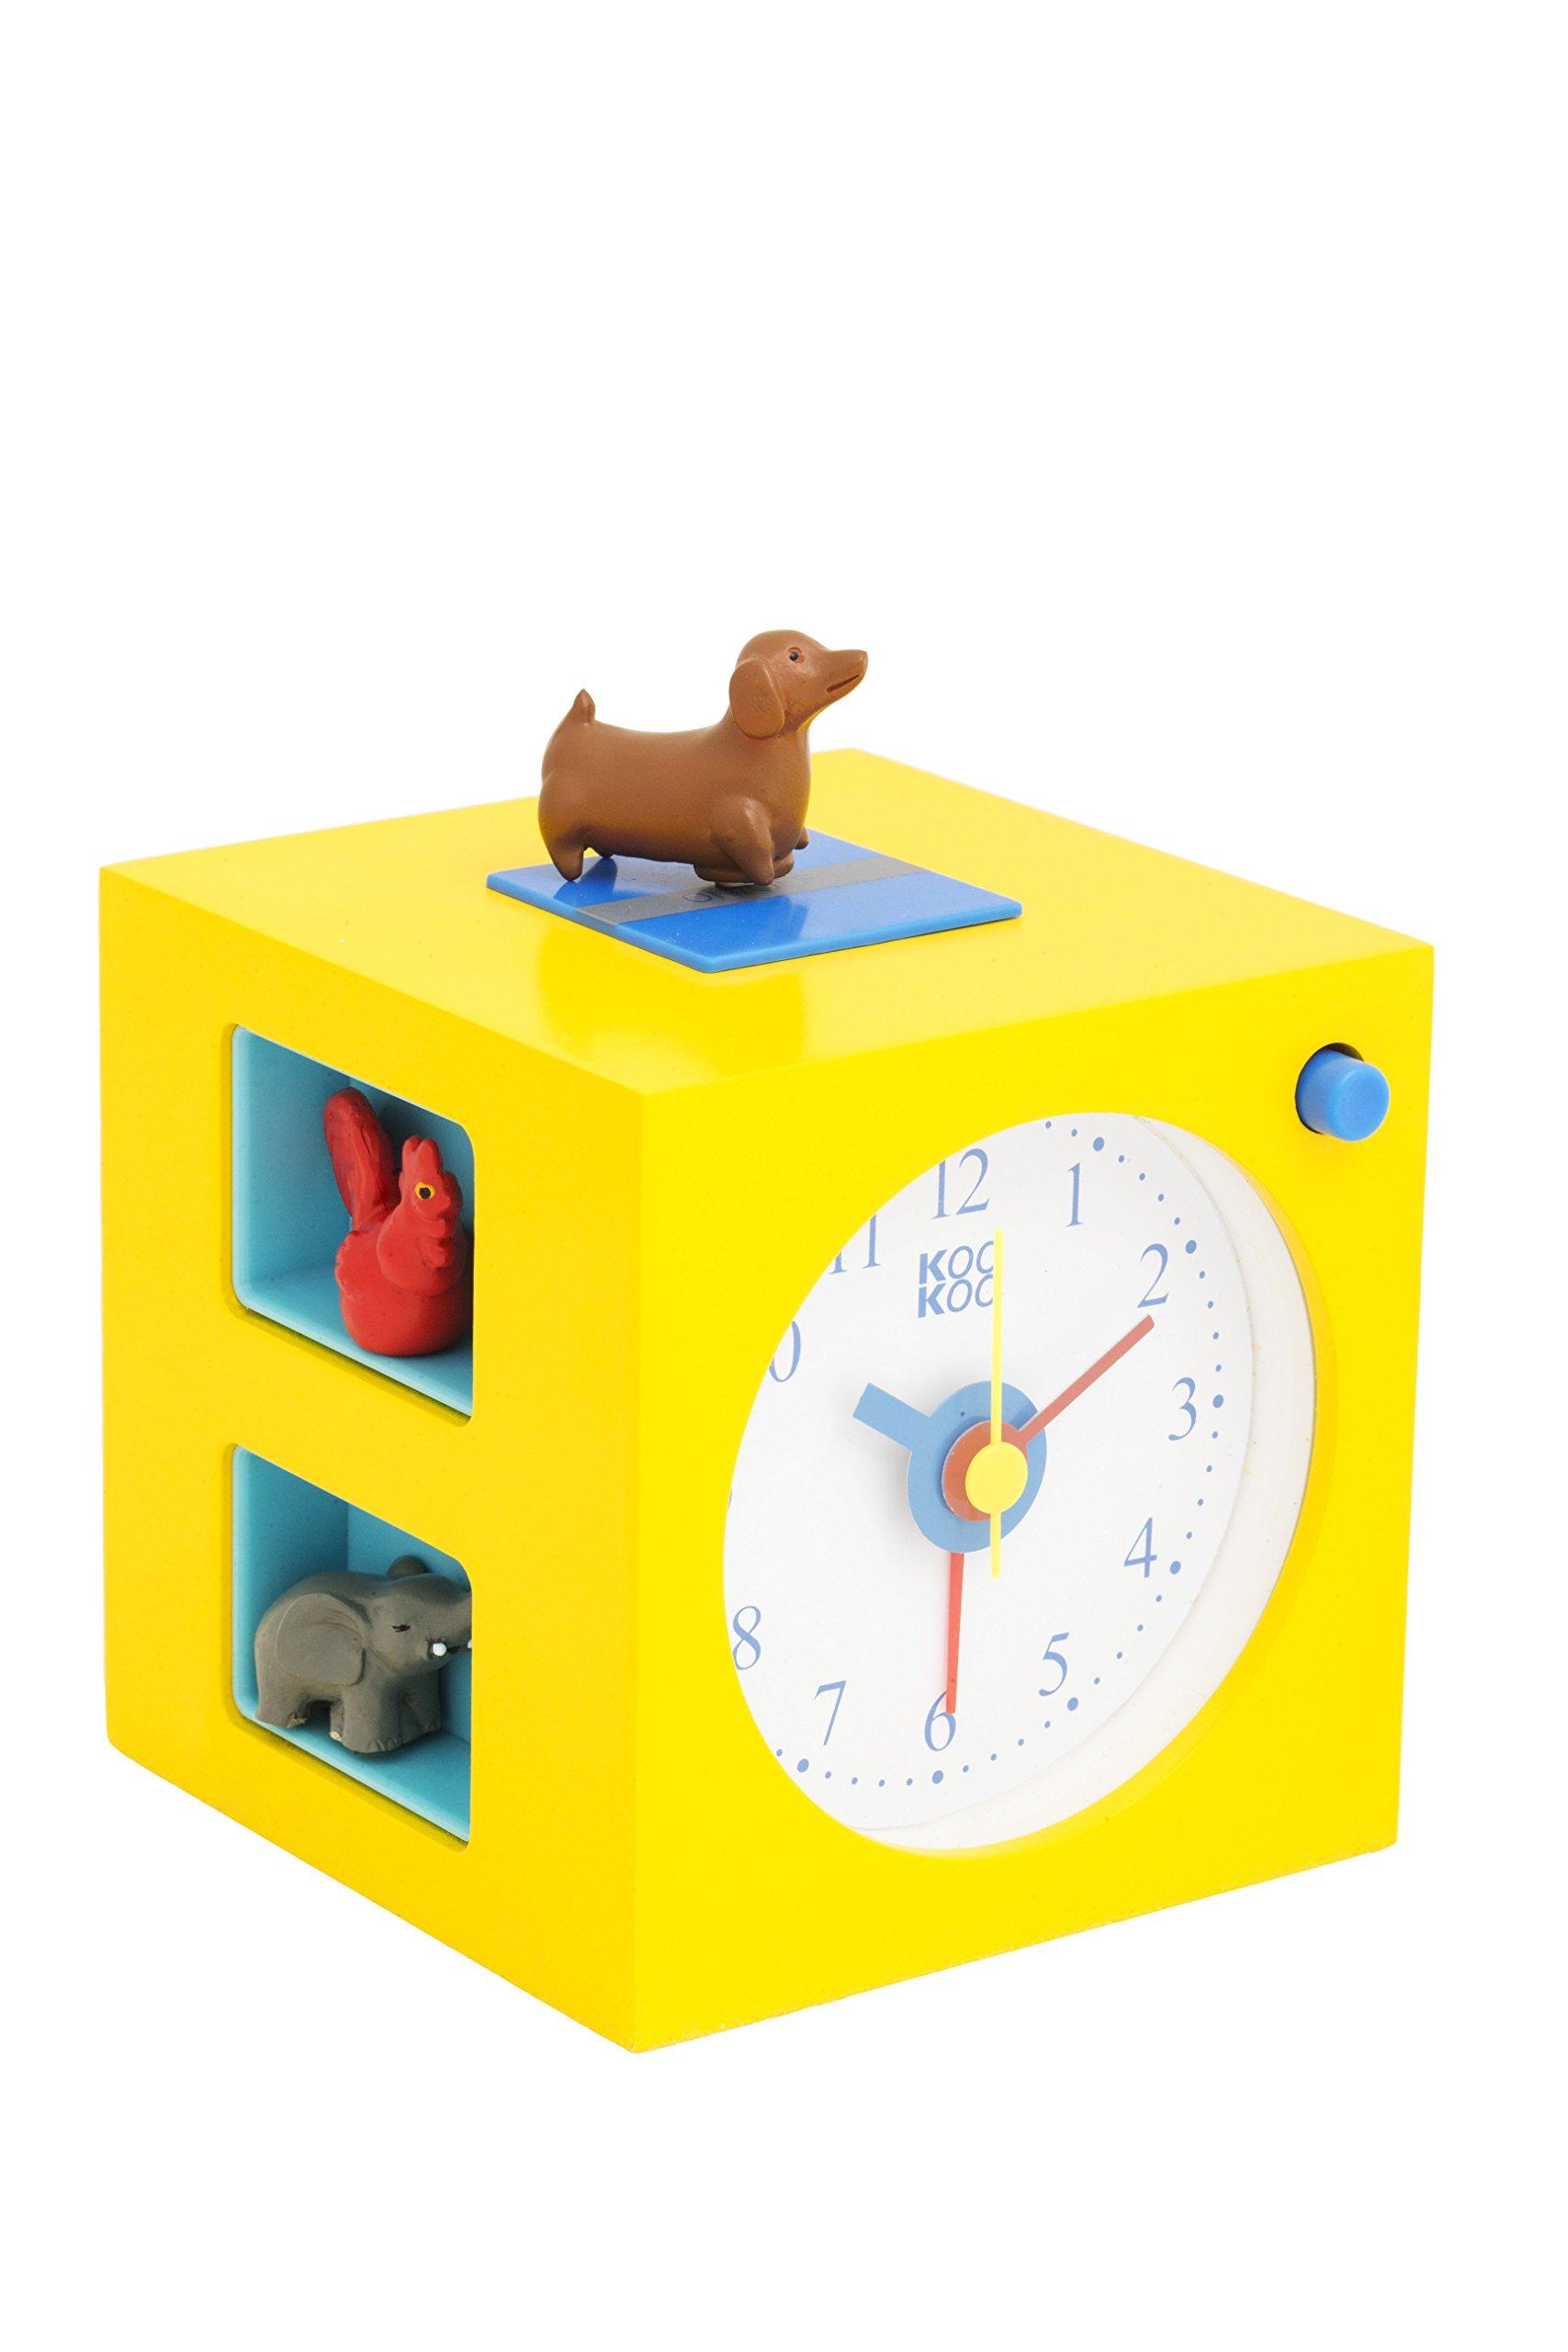 KOOKOO KidsAlarm yellow alarm clock for children including 5 magnetic animals and 5 animal calls field recording wood clock